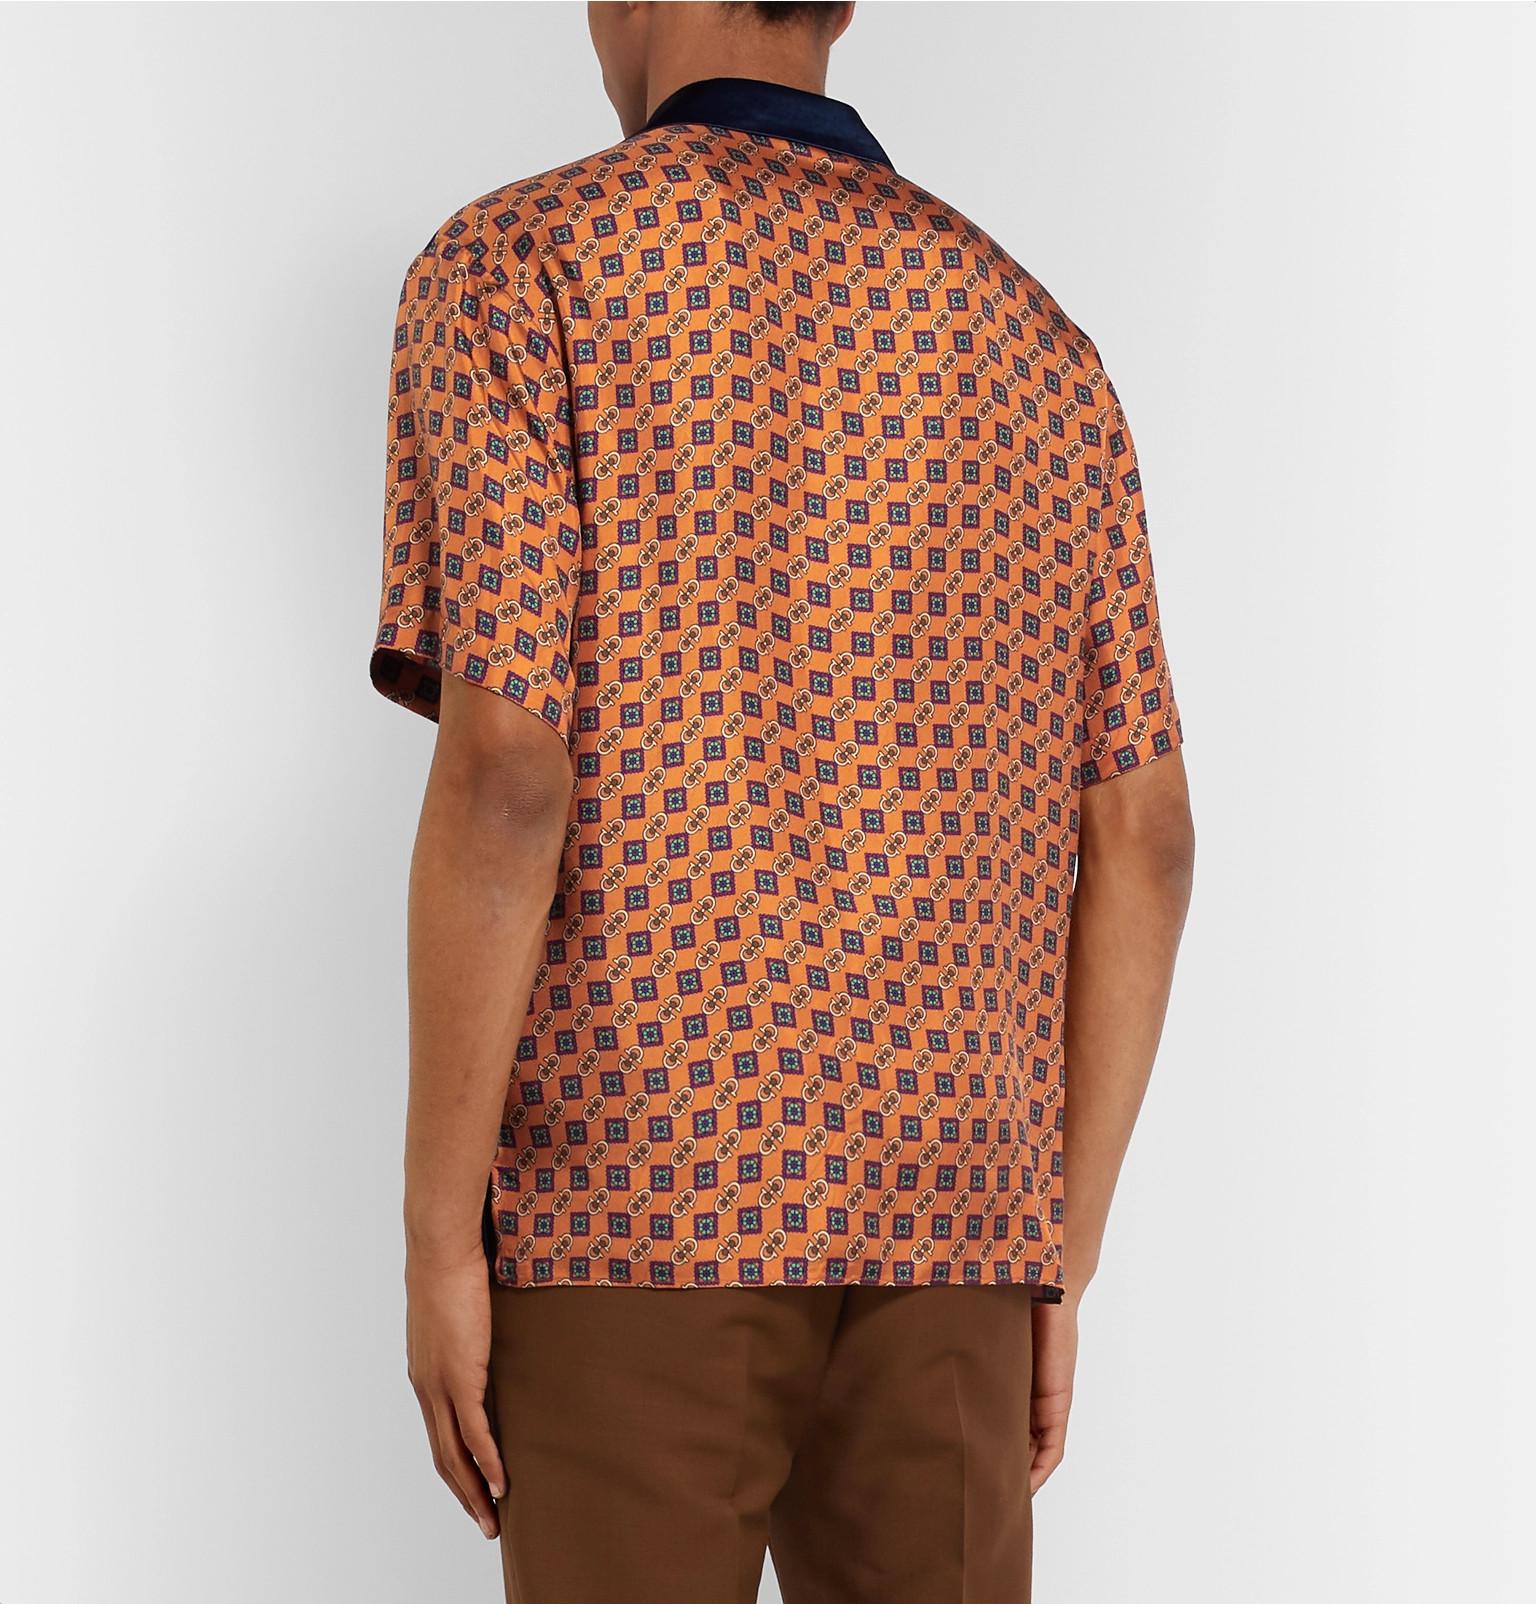 fd58f100d Gucci - Camp-Collar Satin and Printed Silk-Twill Shirt